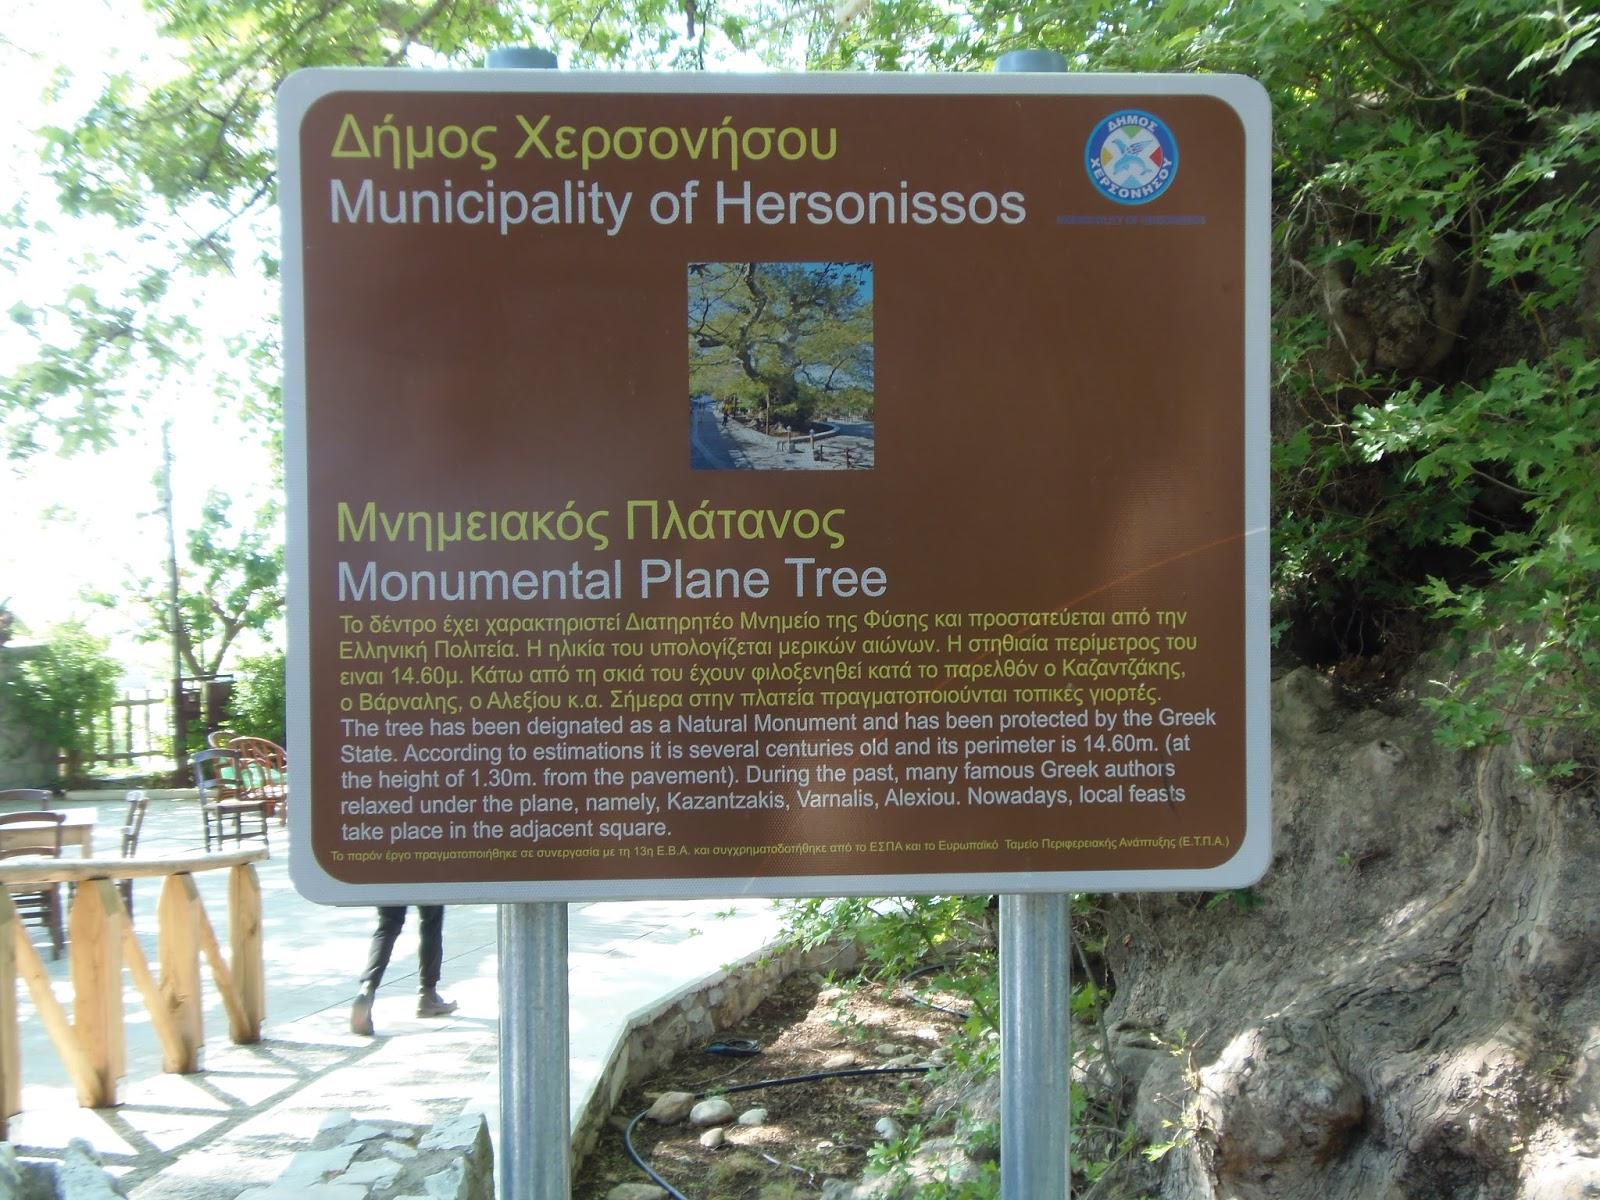 crete, sign, tree, pregnancy, greece, greek, olive tree, fig tree, travel, travel blogger